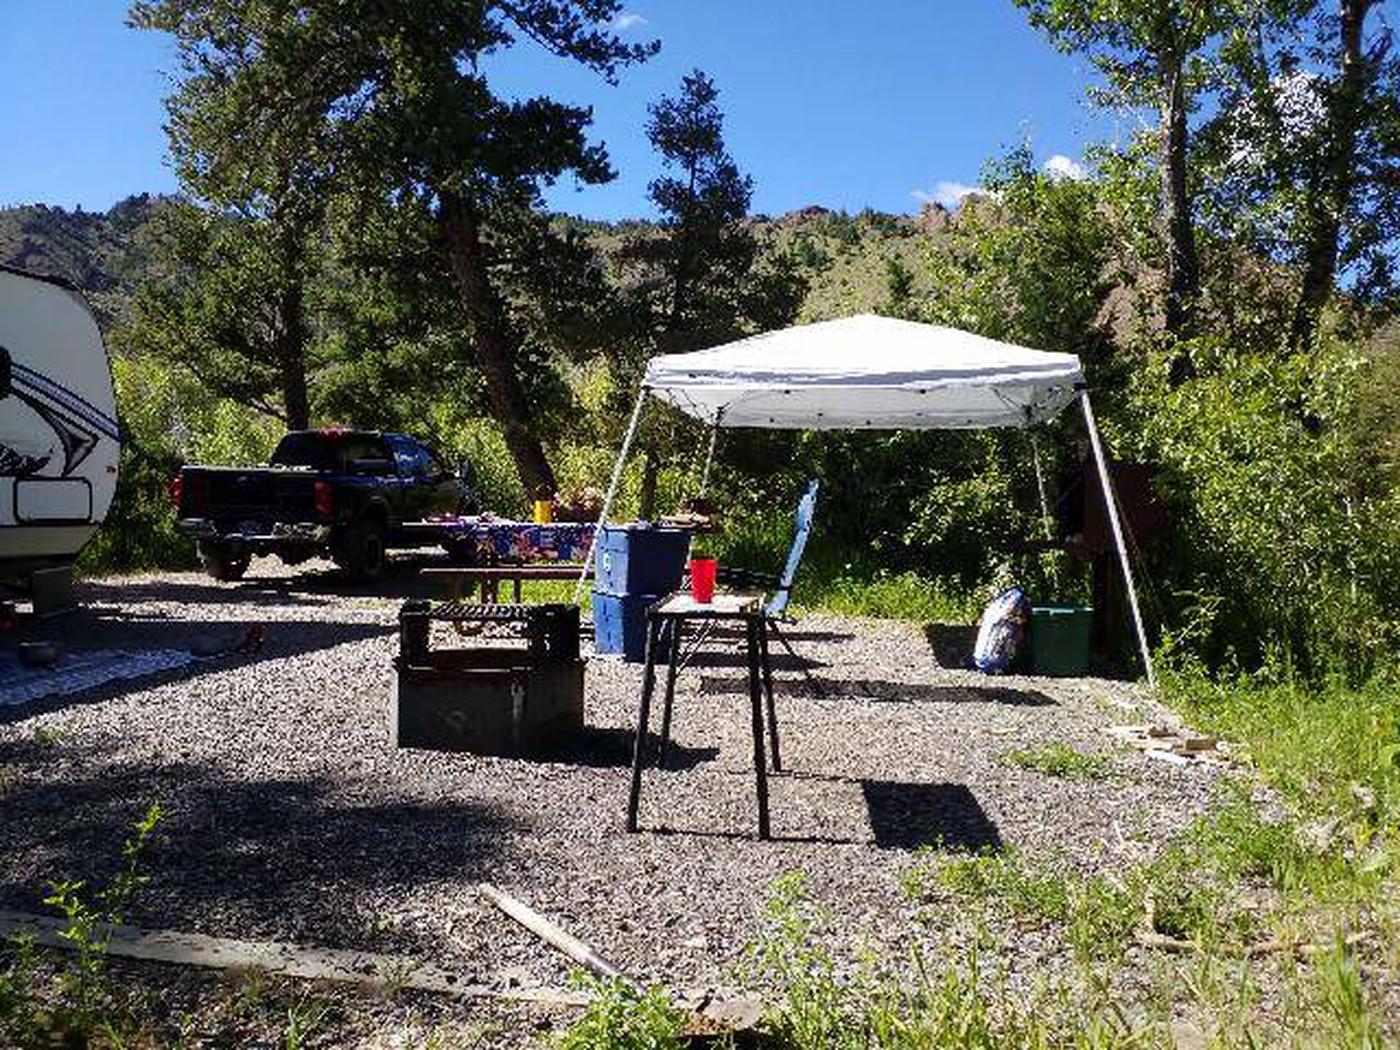 Wapiti Campsite 20 - Side View